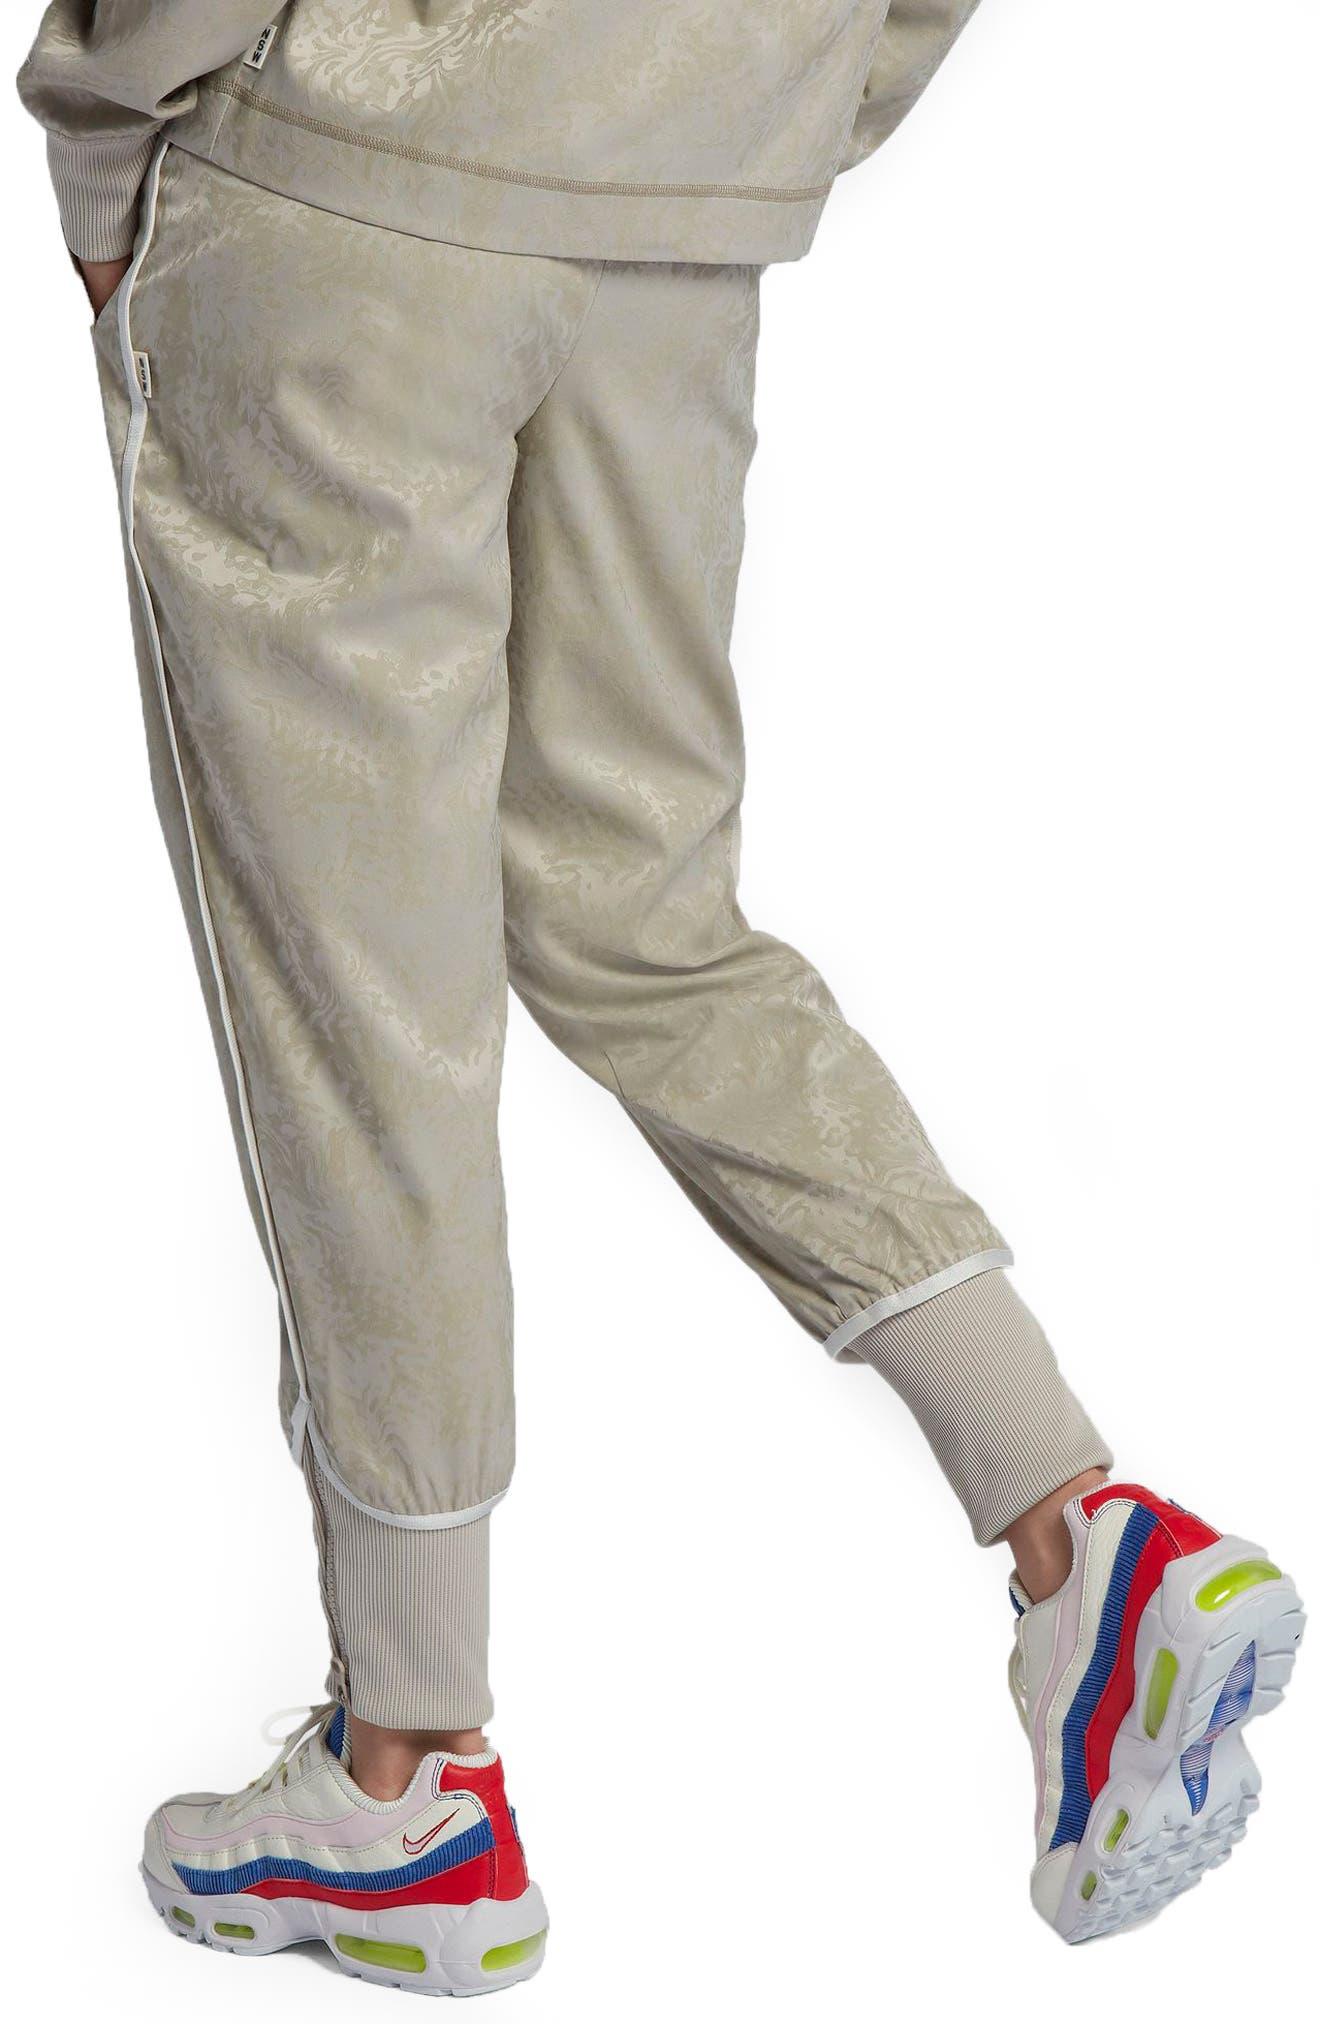 Sportswear NSW Women's Track Pants,                             Alternate thumbnail 3, color,                             201